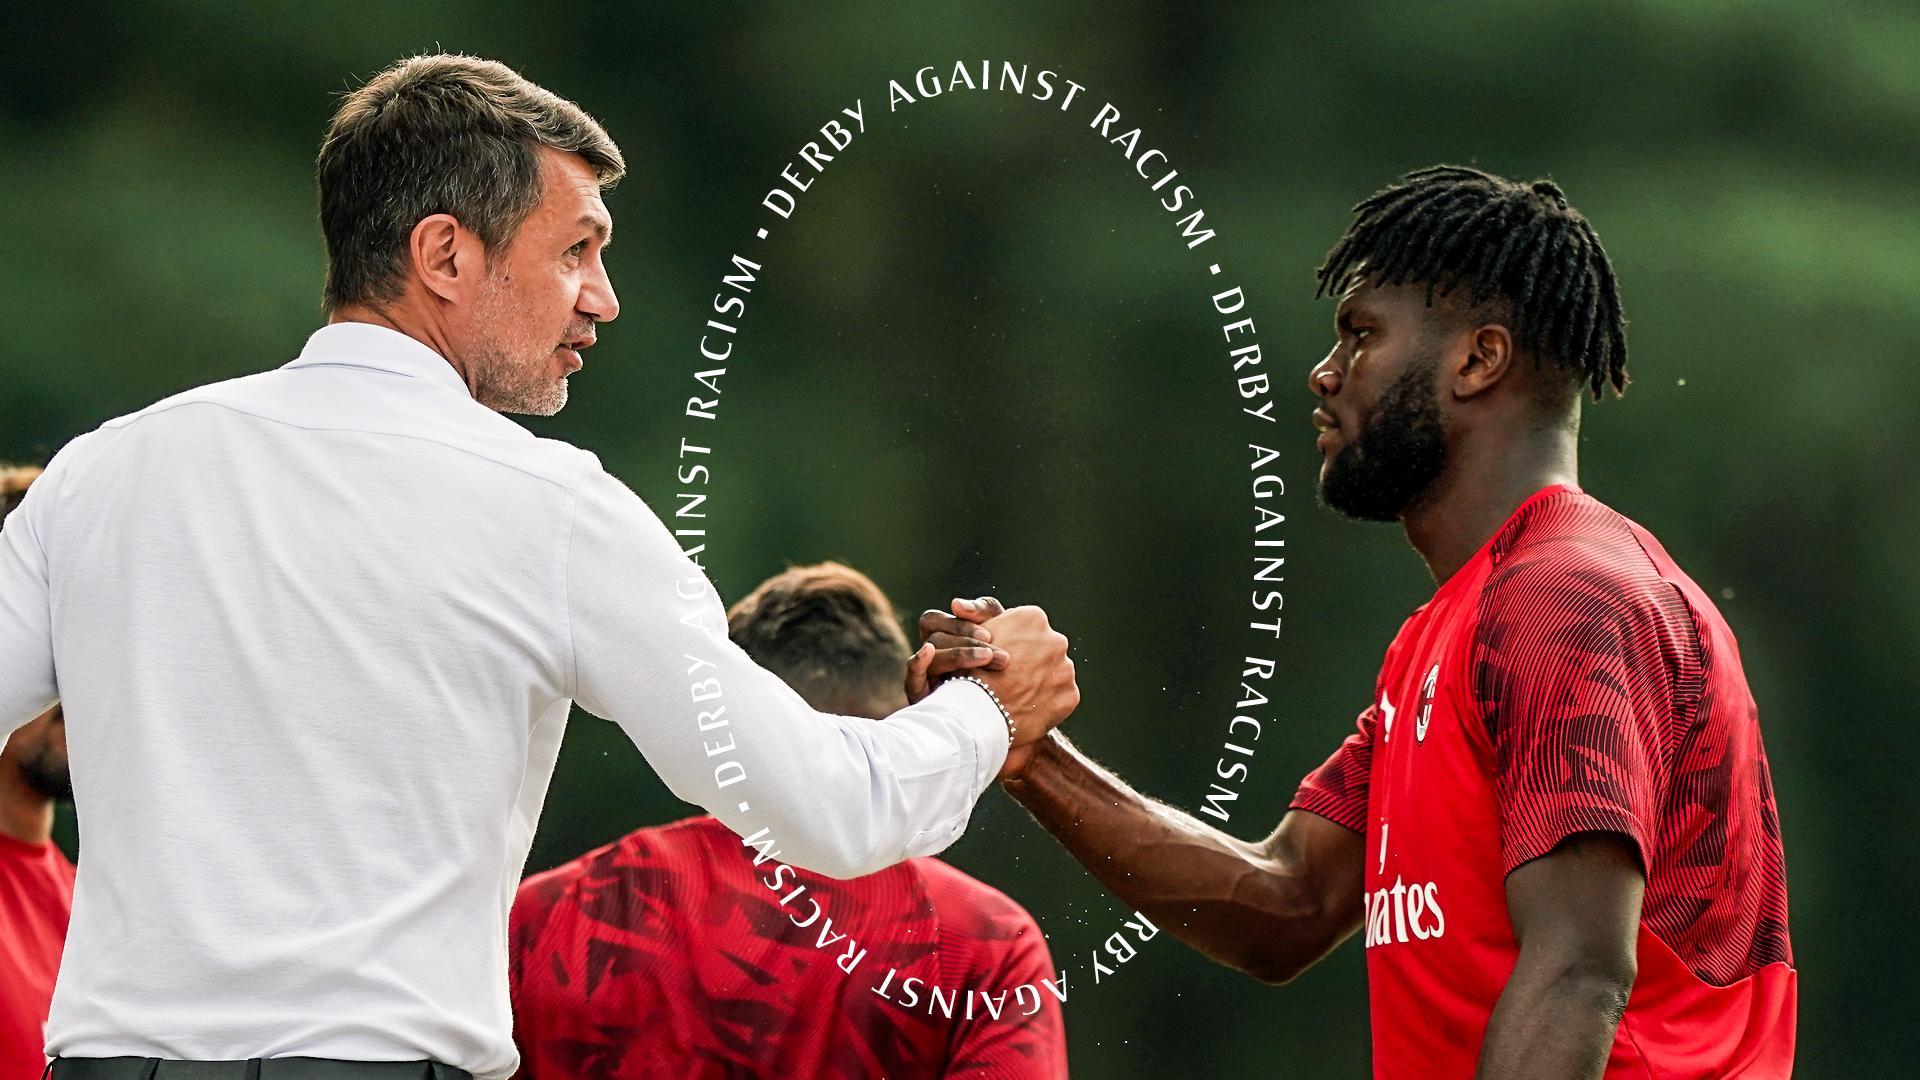 میلان-اینتر-سری آ-Milan-نژادپرستی-ایتالیا-نژادپرستی در فوتبال